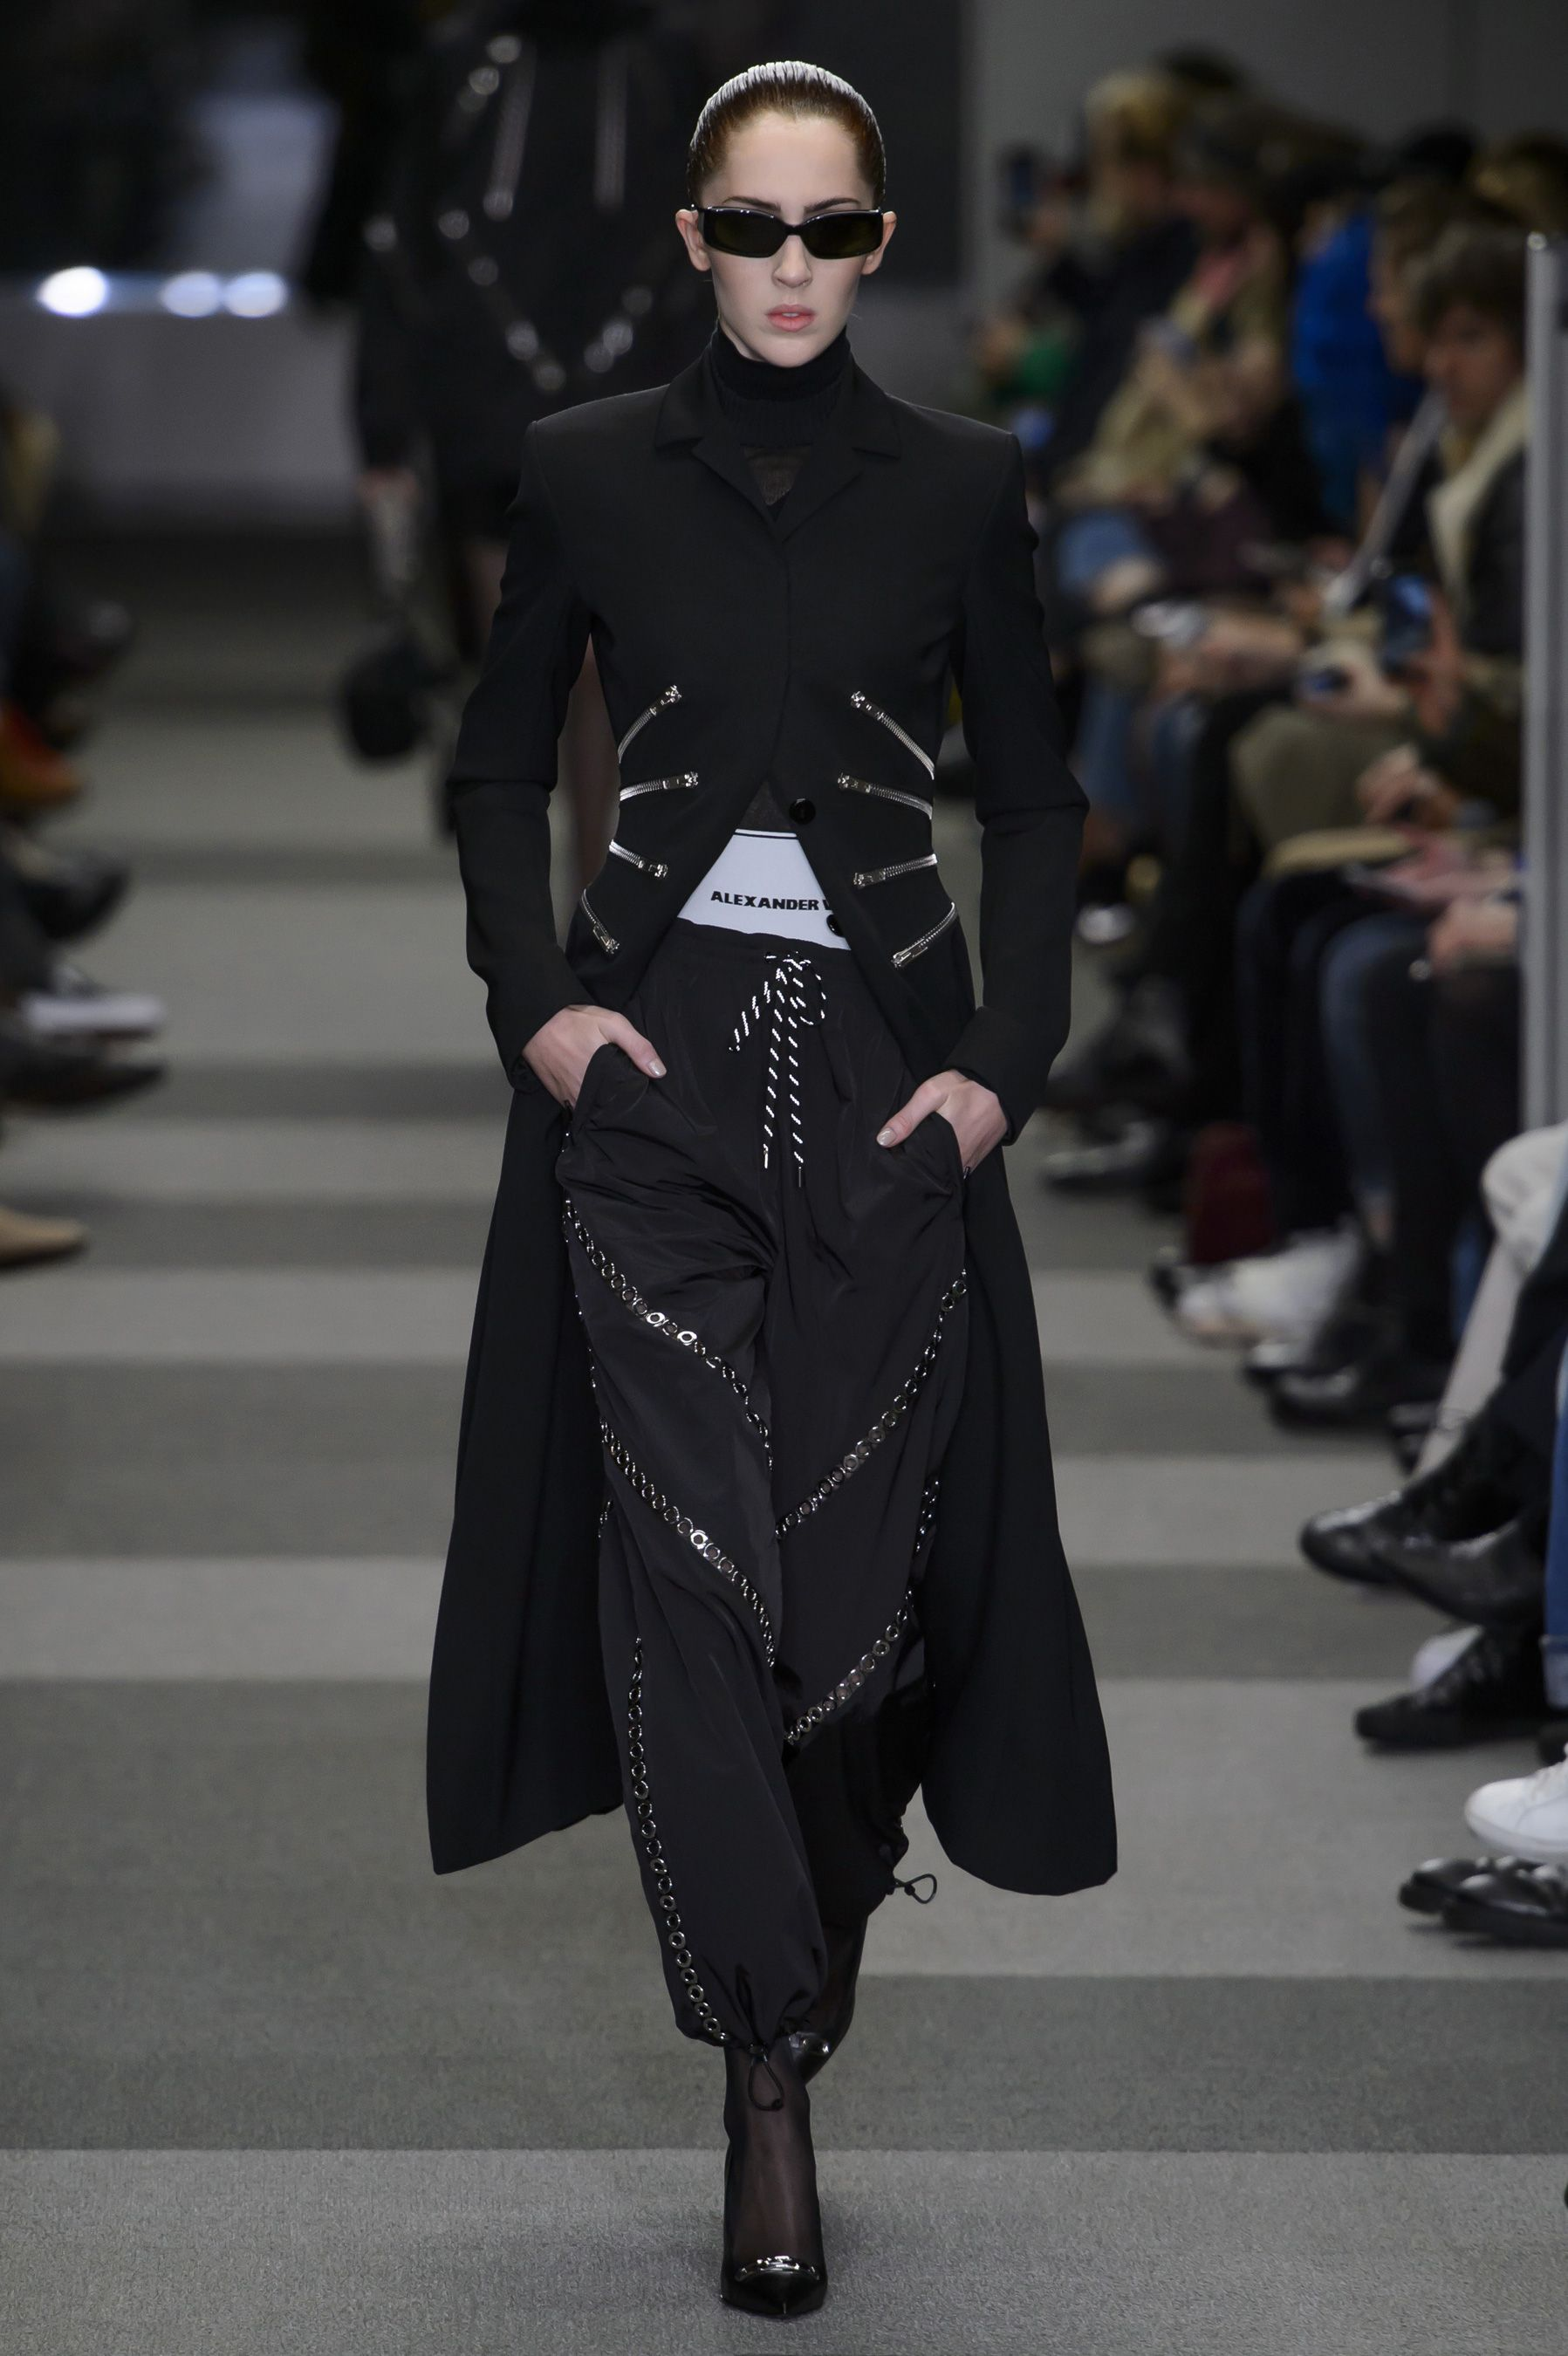 4db1af952bdbc 43 Looks From Alexander Wang Fall 2018 NYFW Show – Alexander Wang Runway at  New York Fashion Week